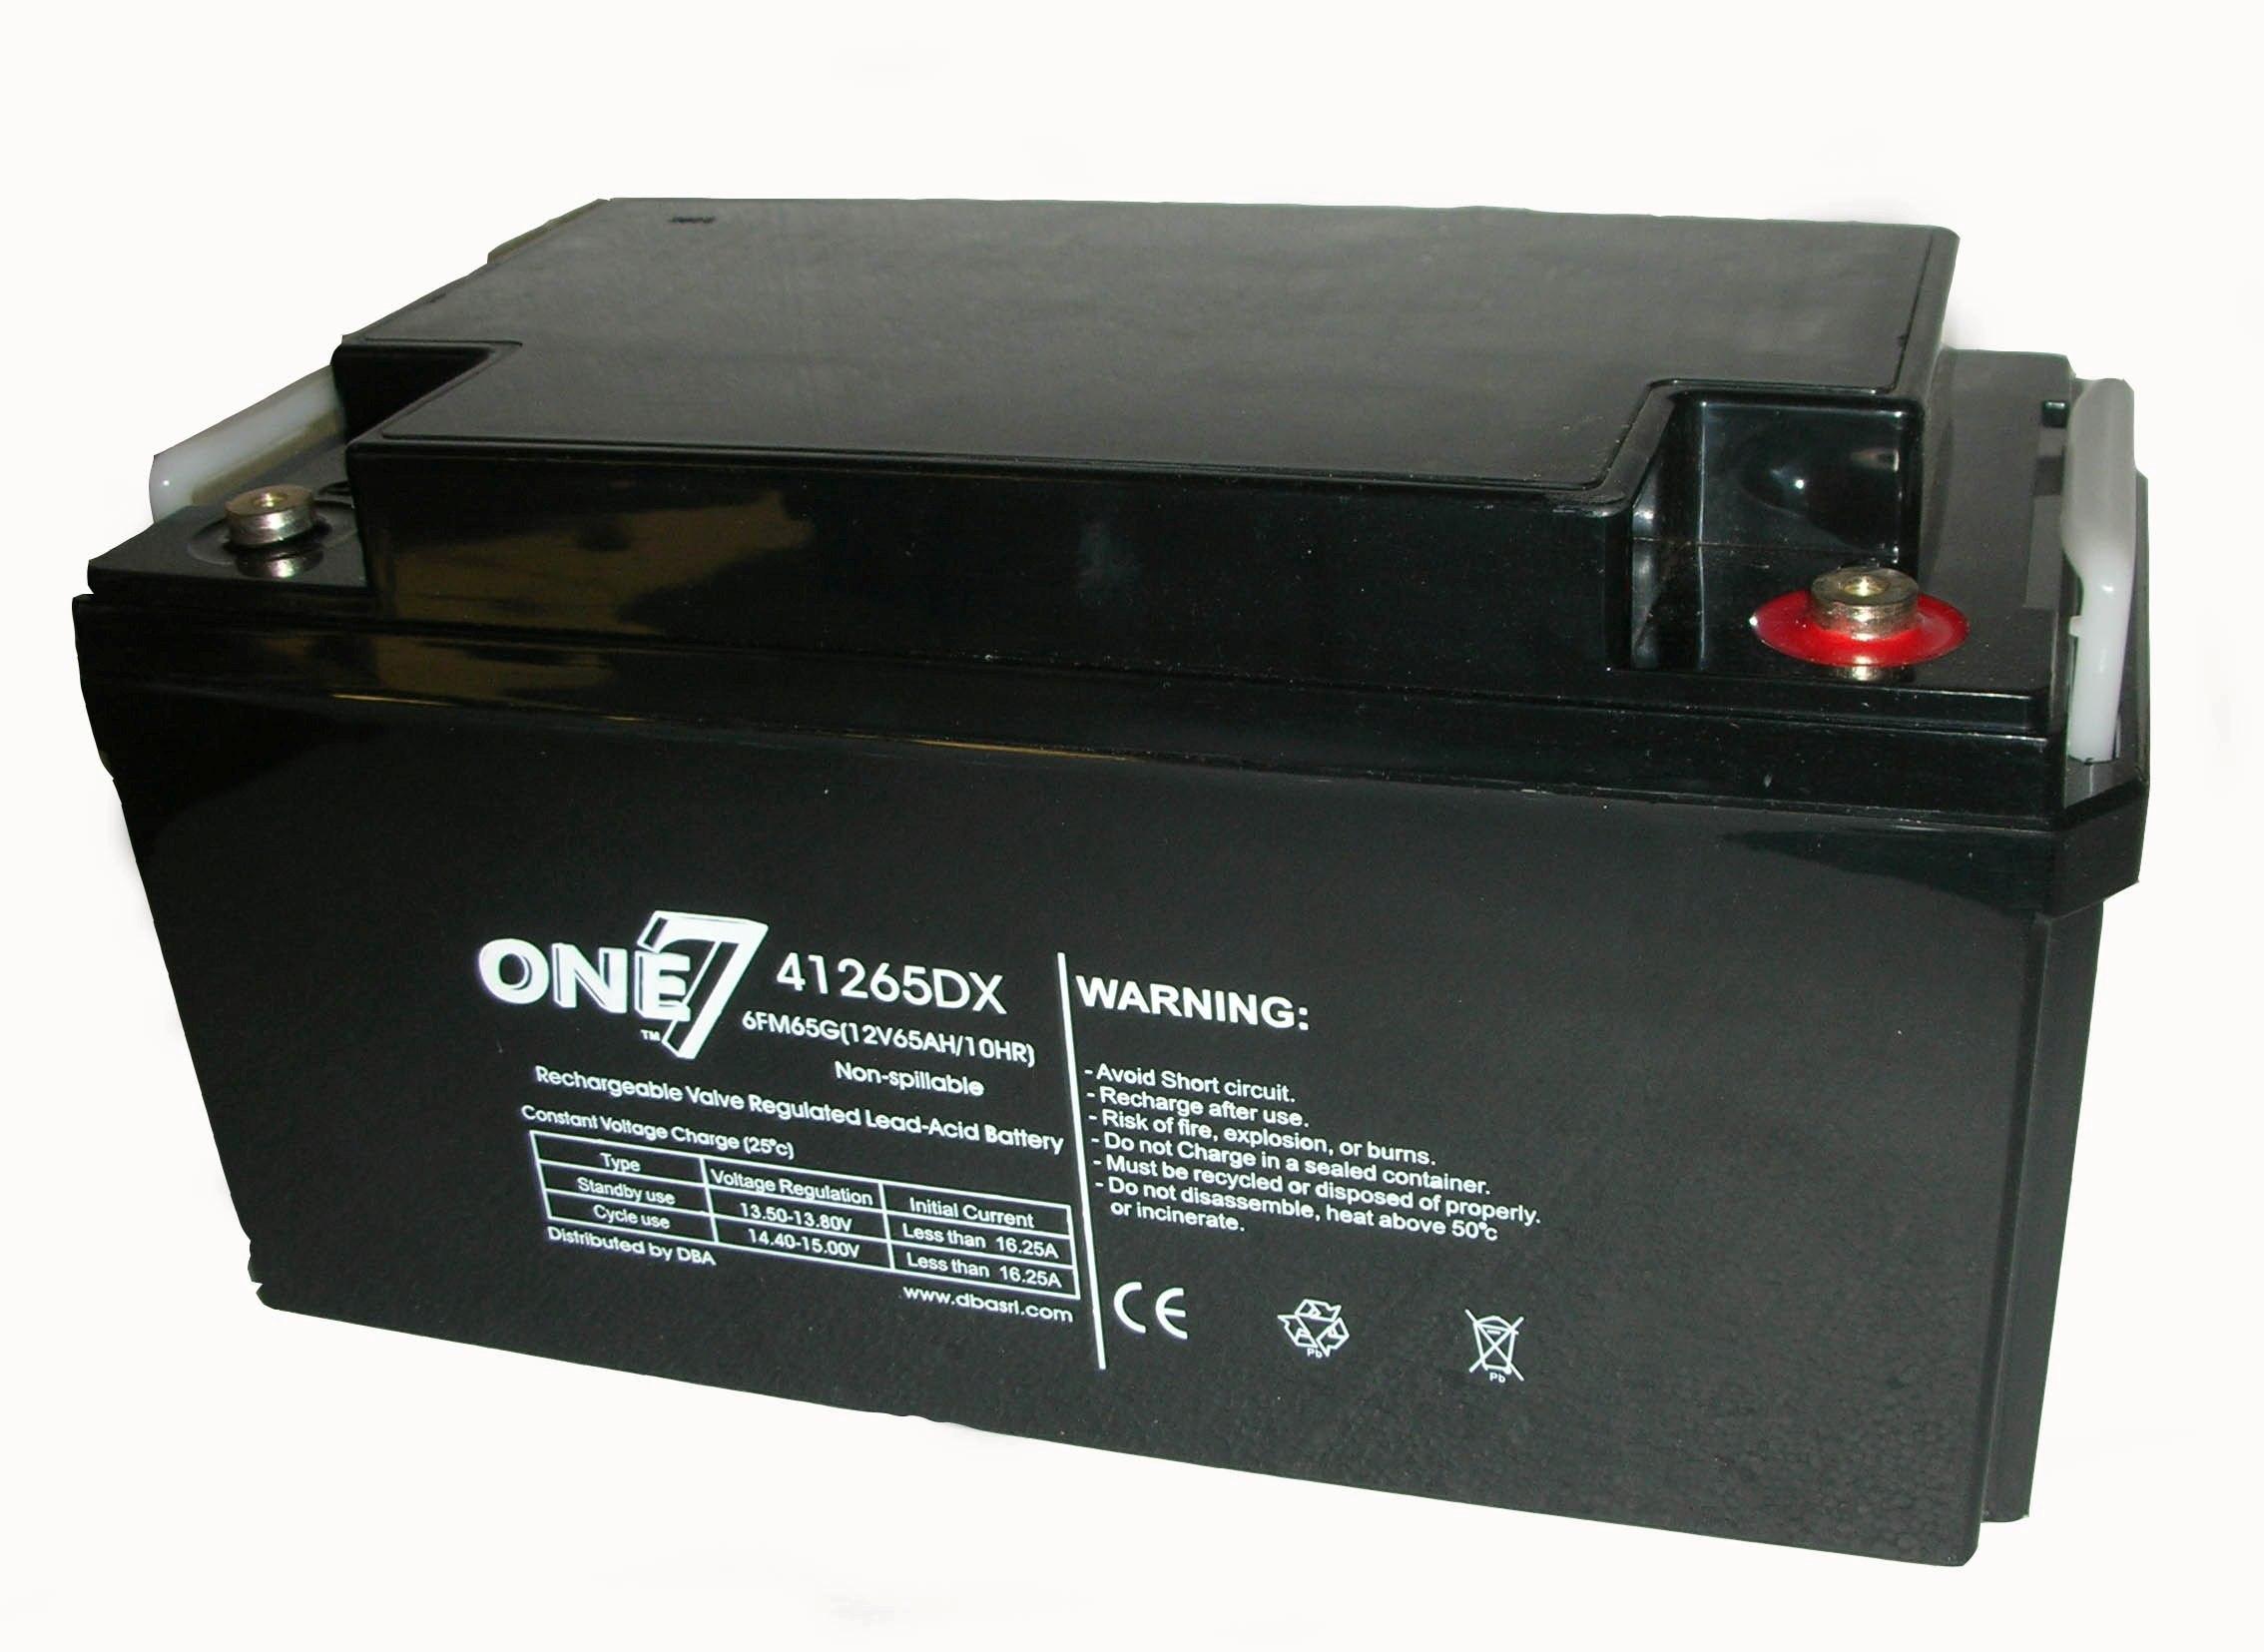 41265DX